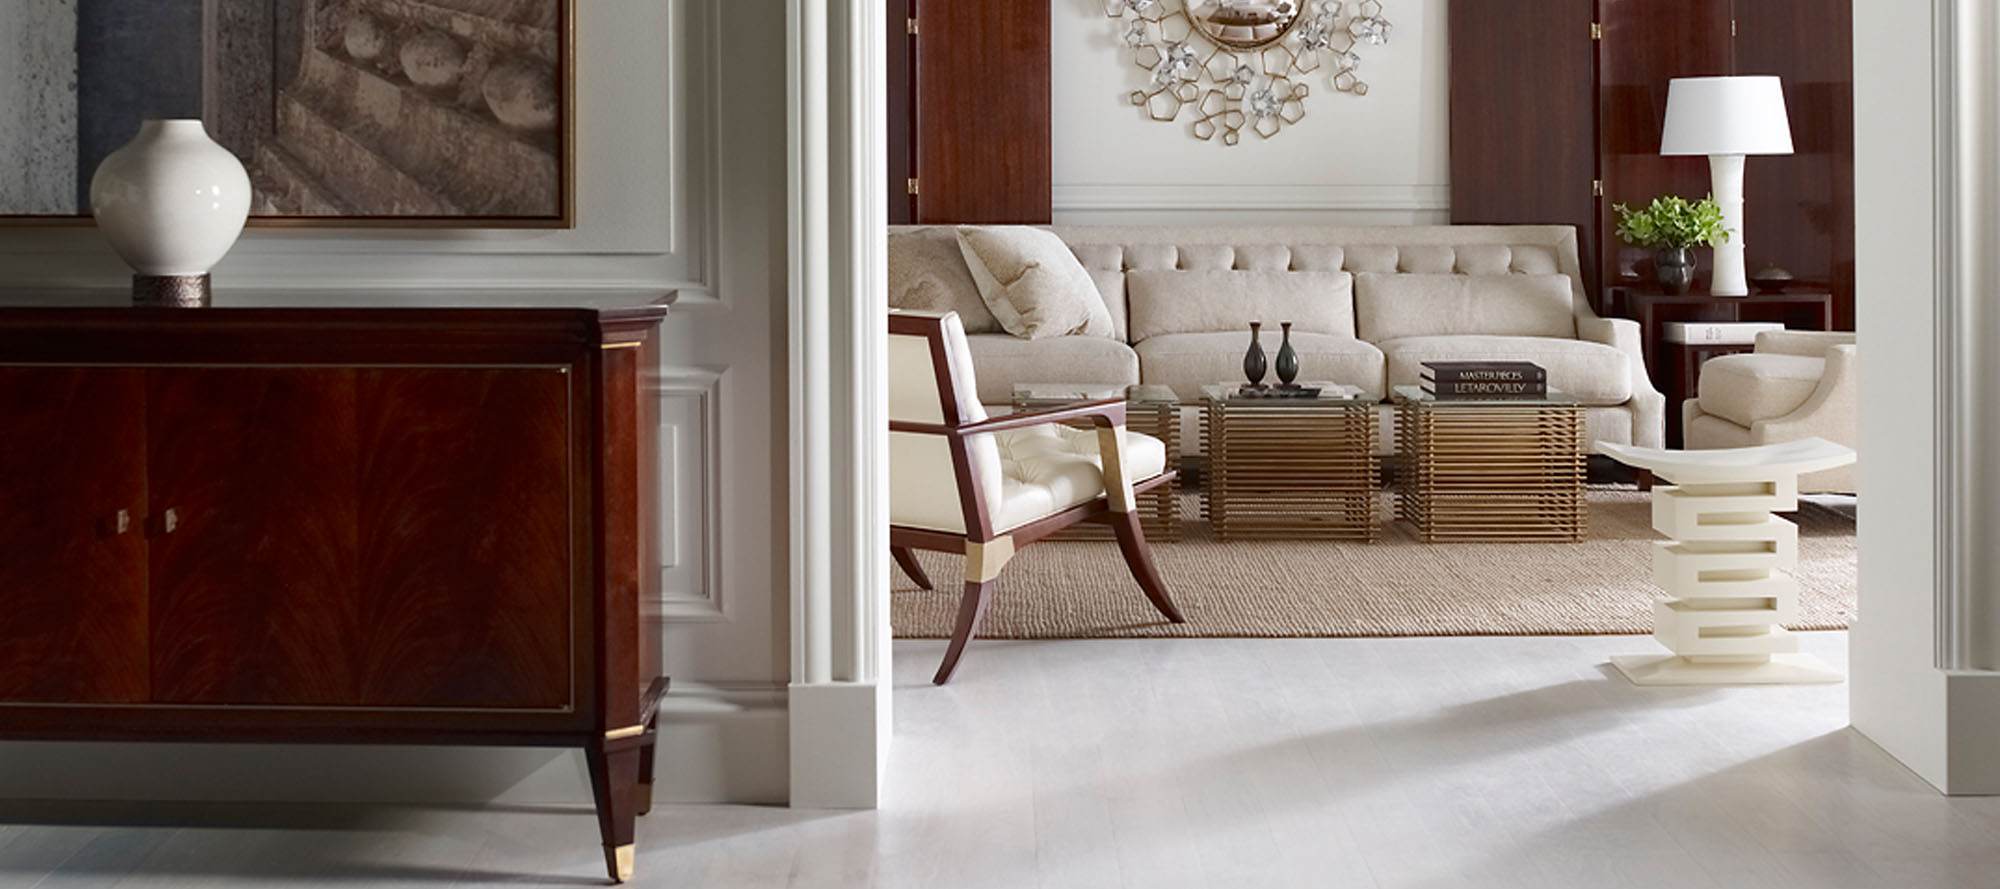 Thomas Pheasant  Baker Furniture